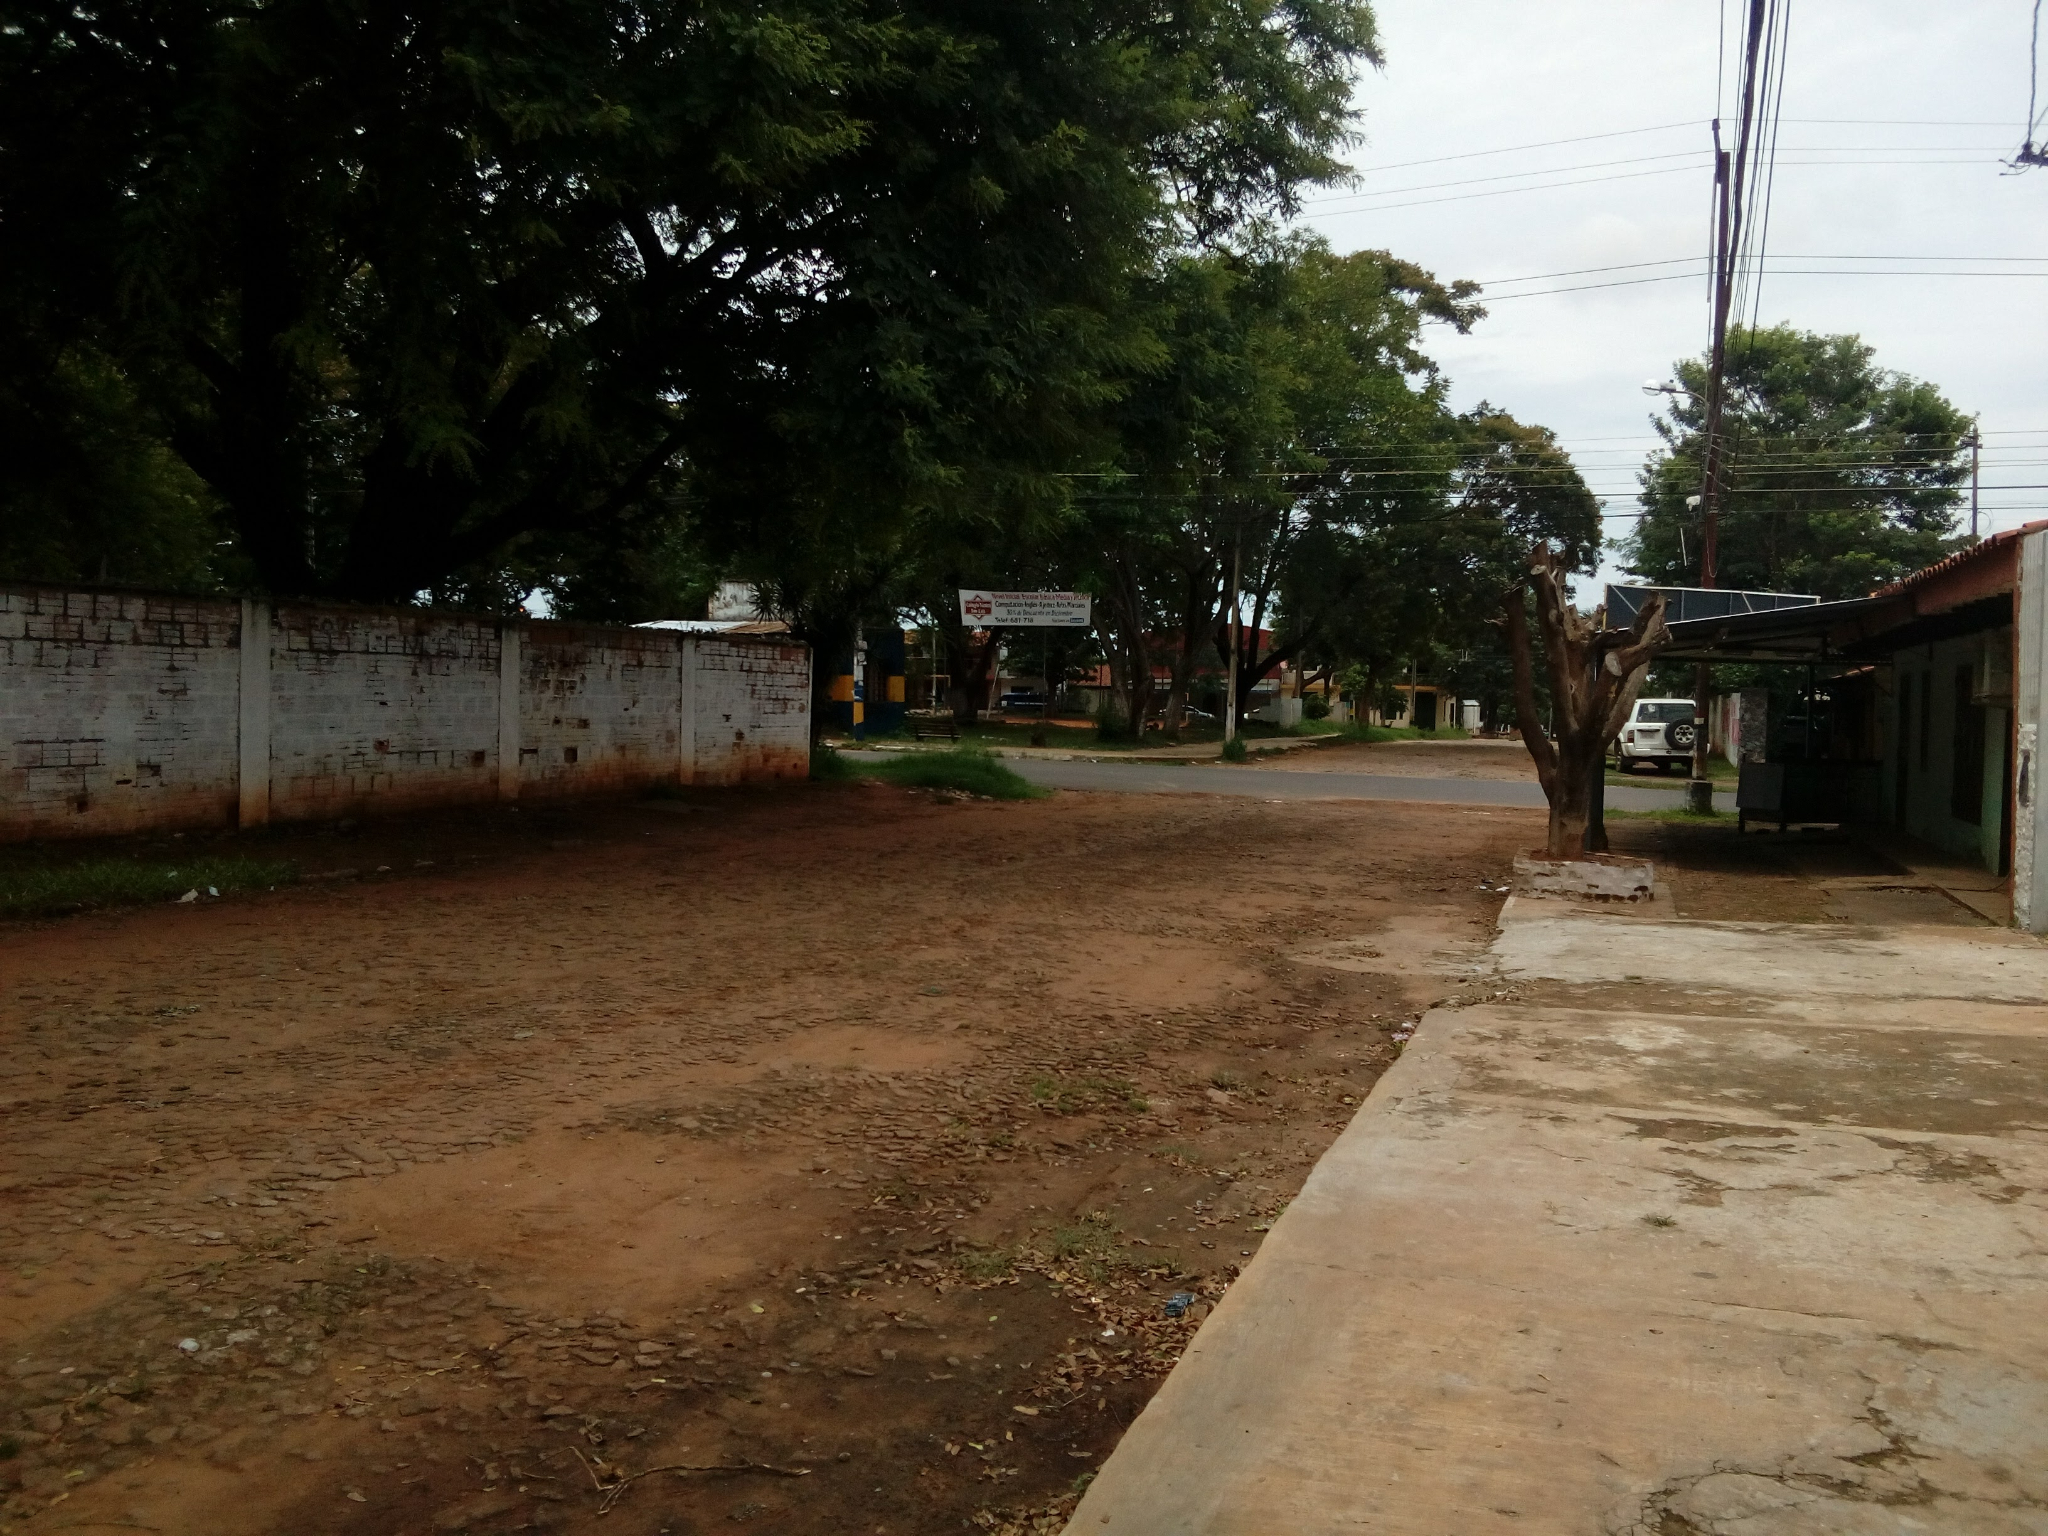 TERRENO: Terreno En Zona Cit en Luque